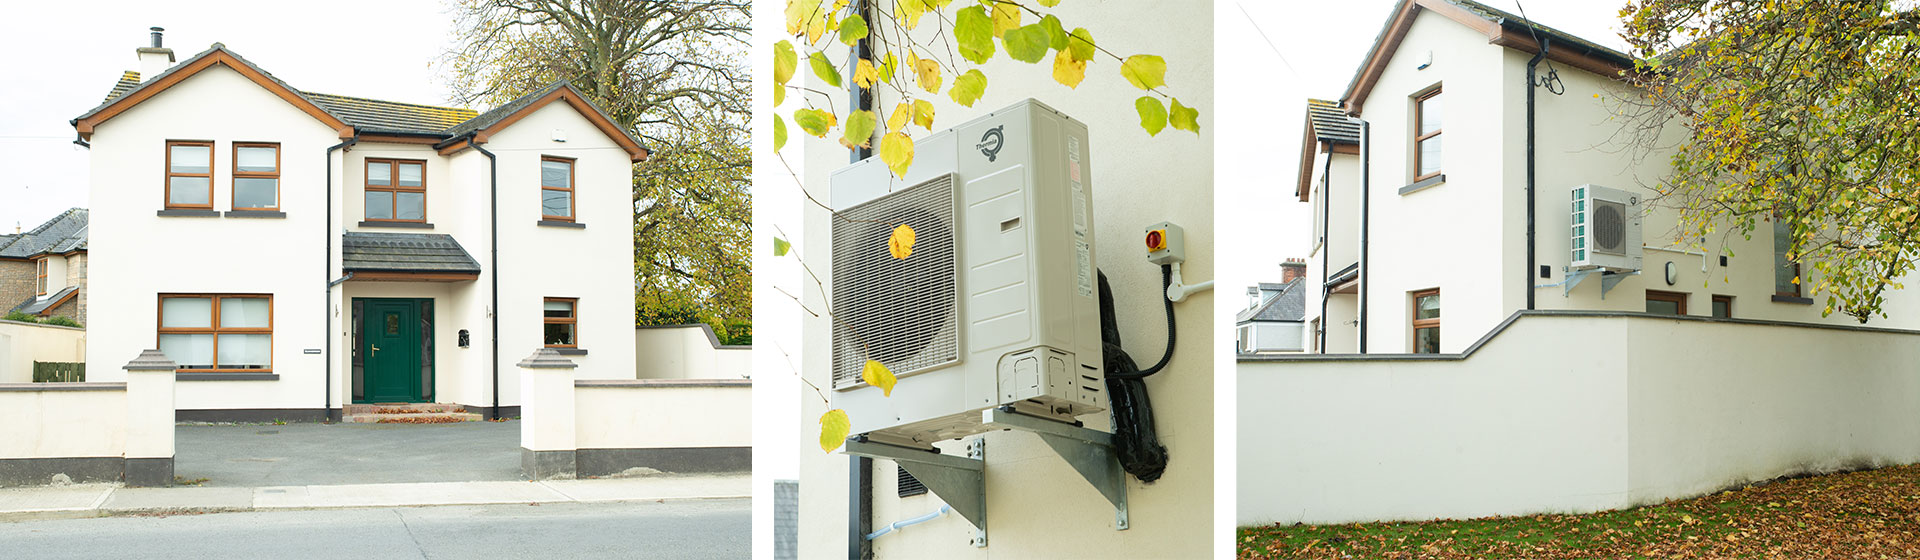 Air-to-Water Heatpump Retrofit with Radiators - Blackrock Co. Louth